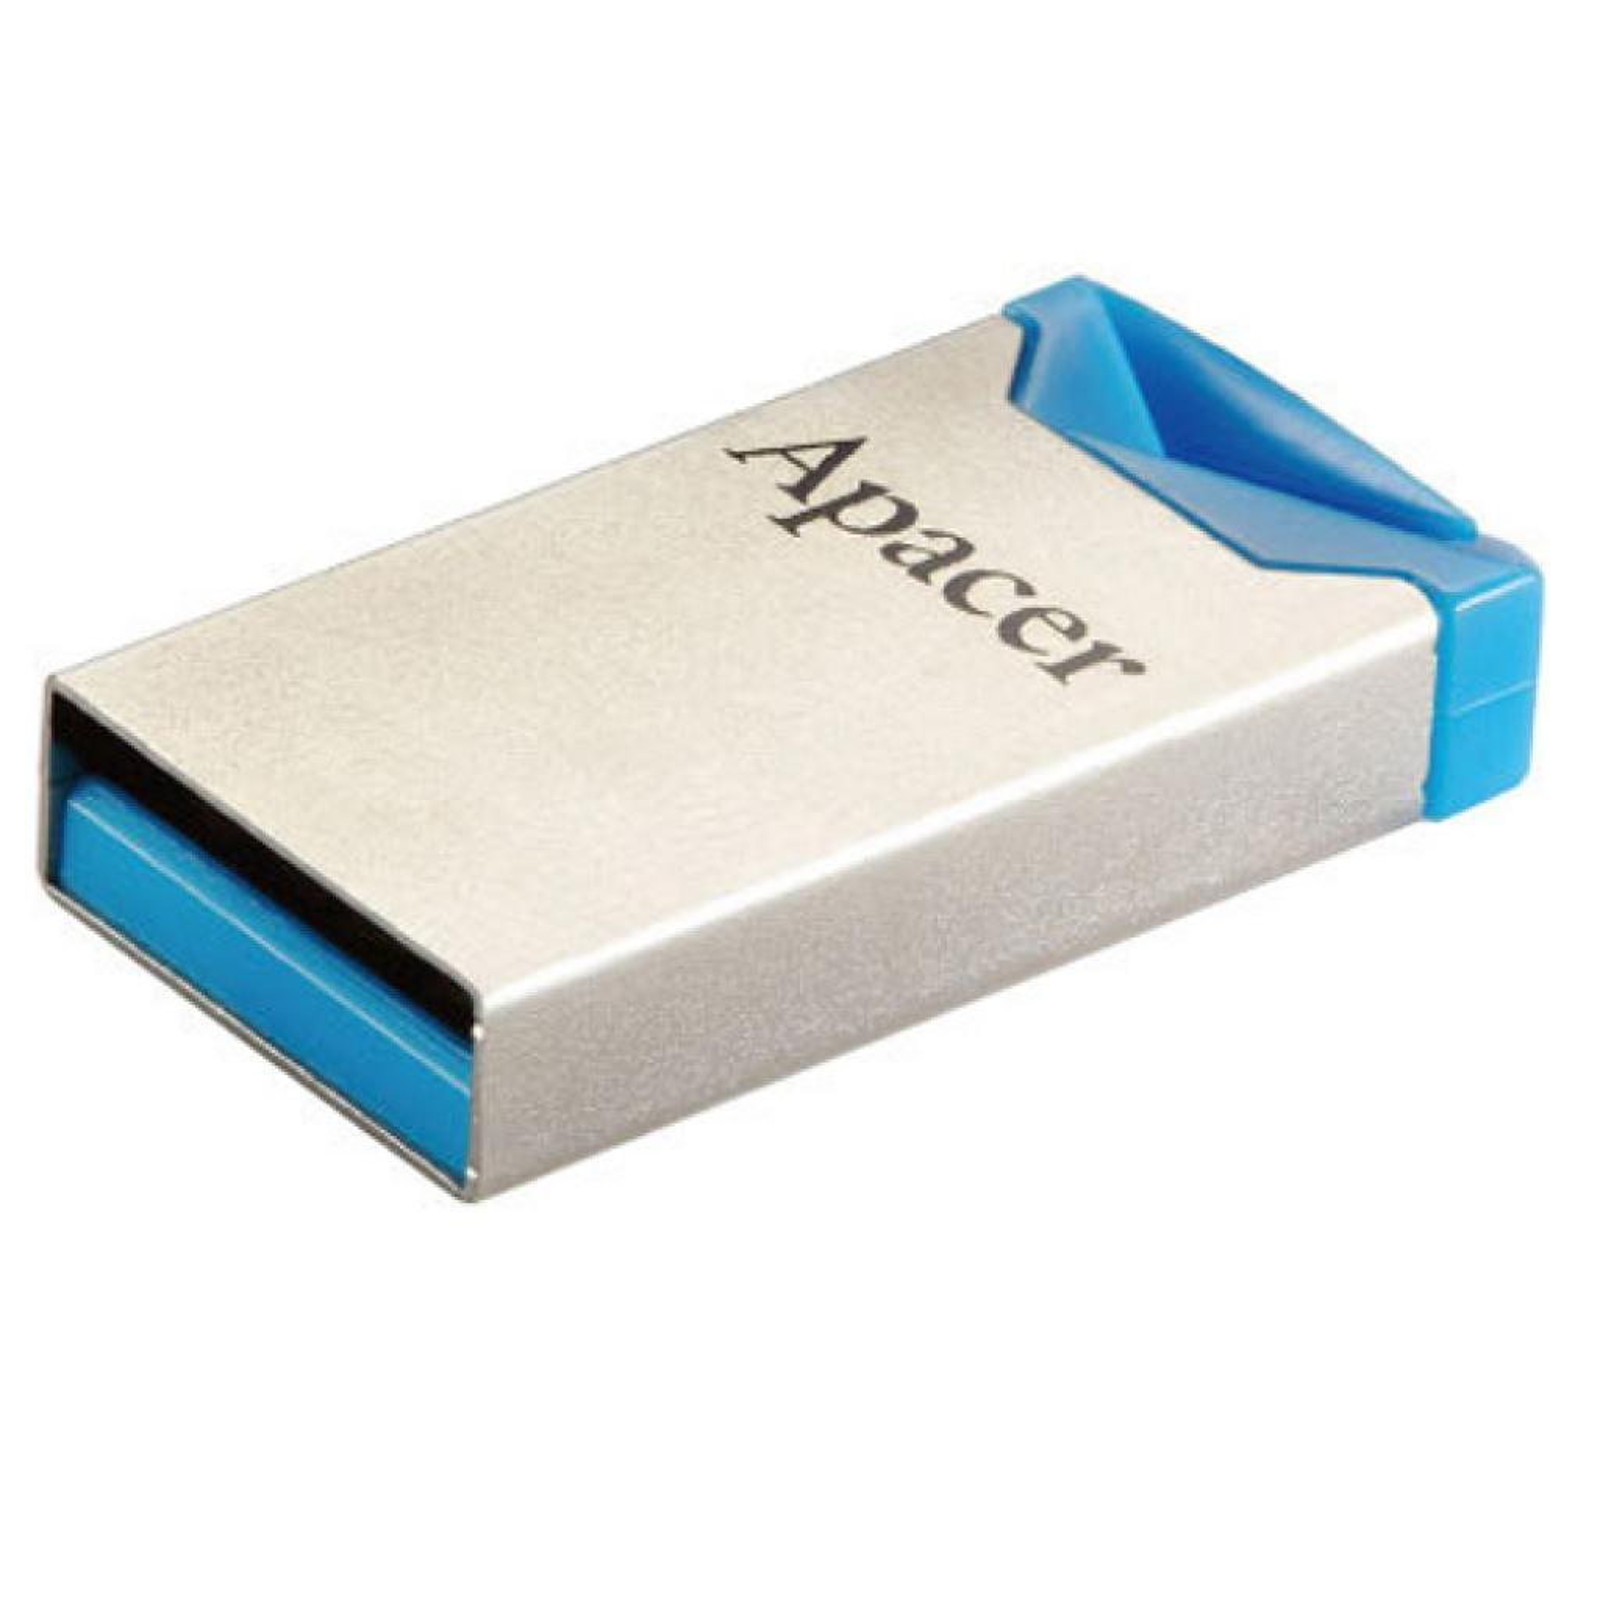 USB флеш накопитель 8GB AH111 Blue RP USB2.0 Apacer (AP8GAH111U-1) изображение 3